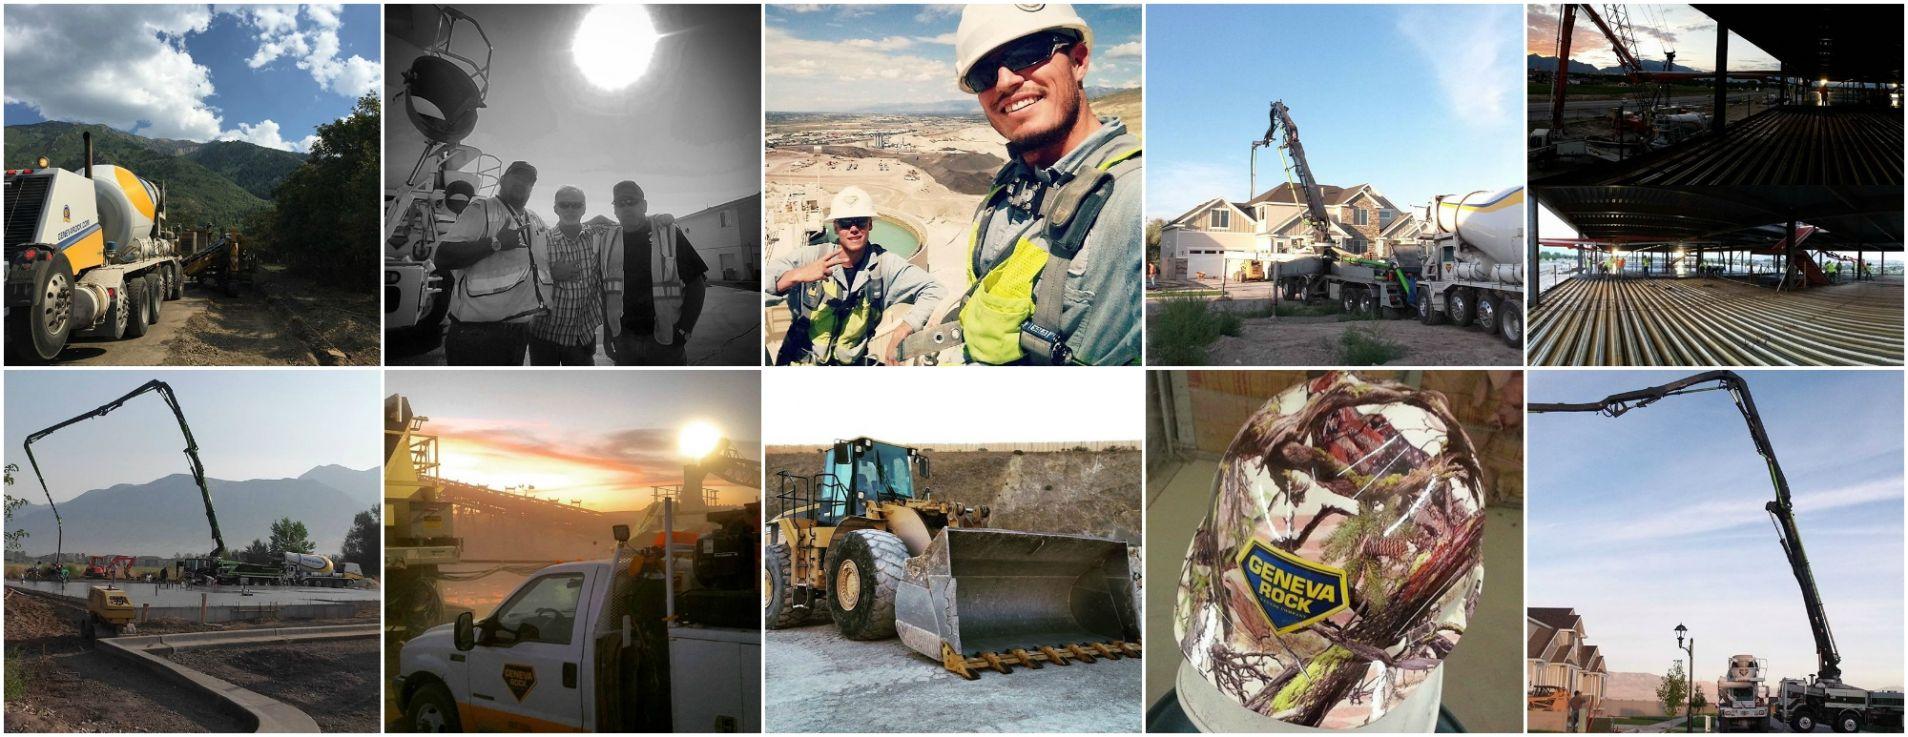 Geneva Rock on Instagram: August Photos